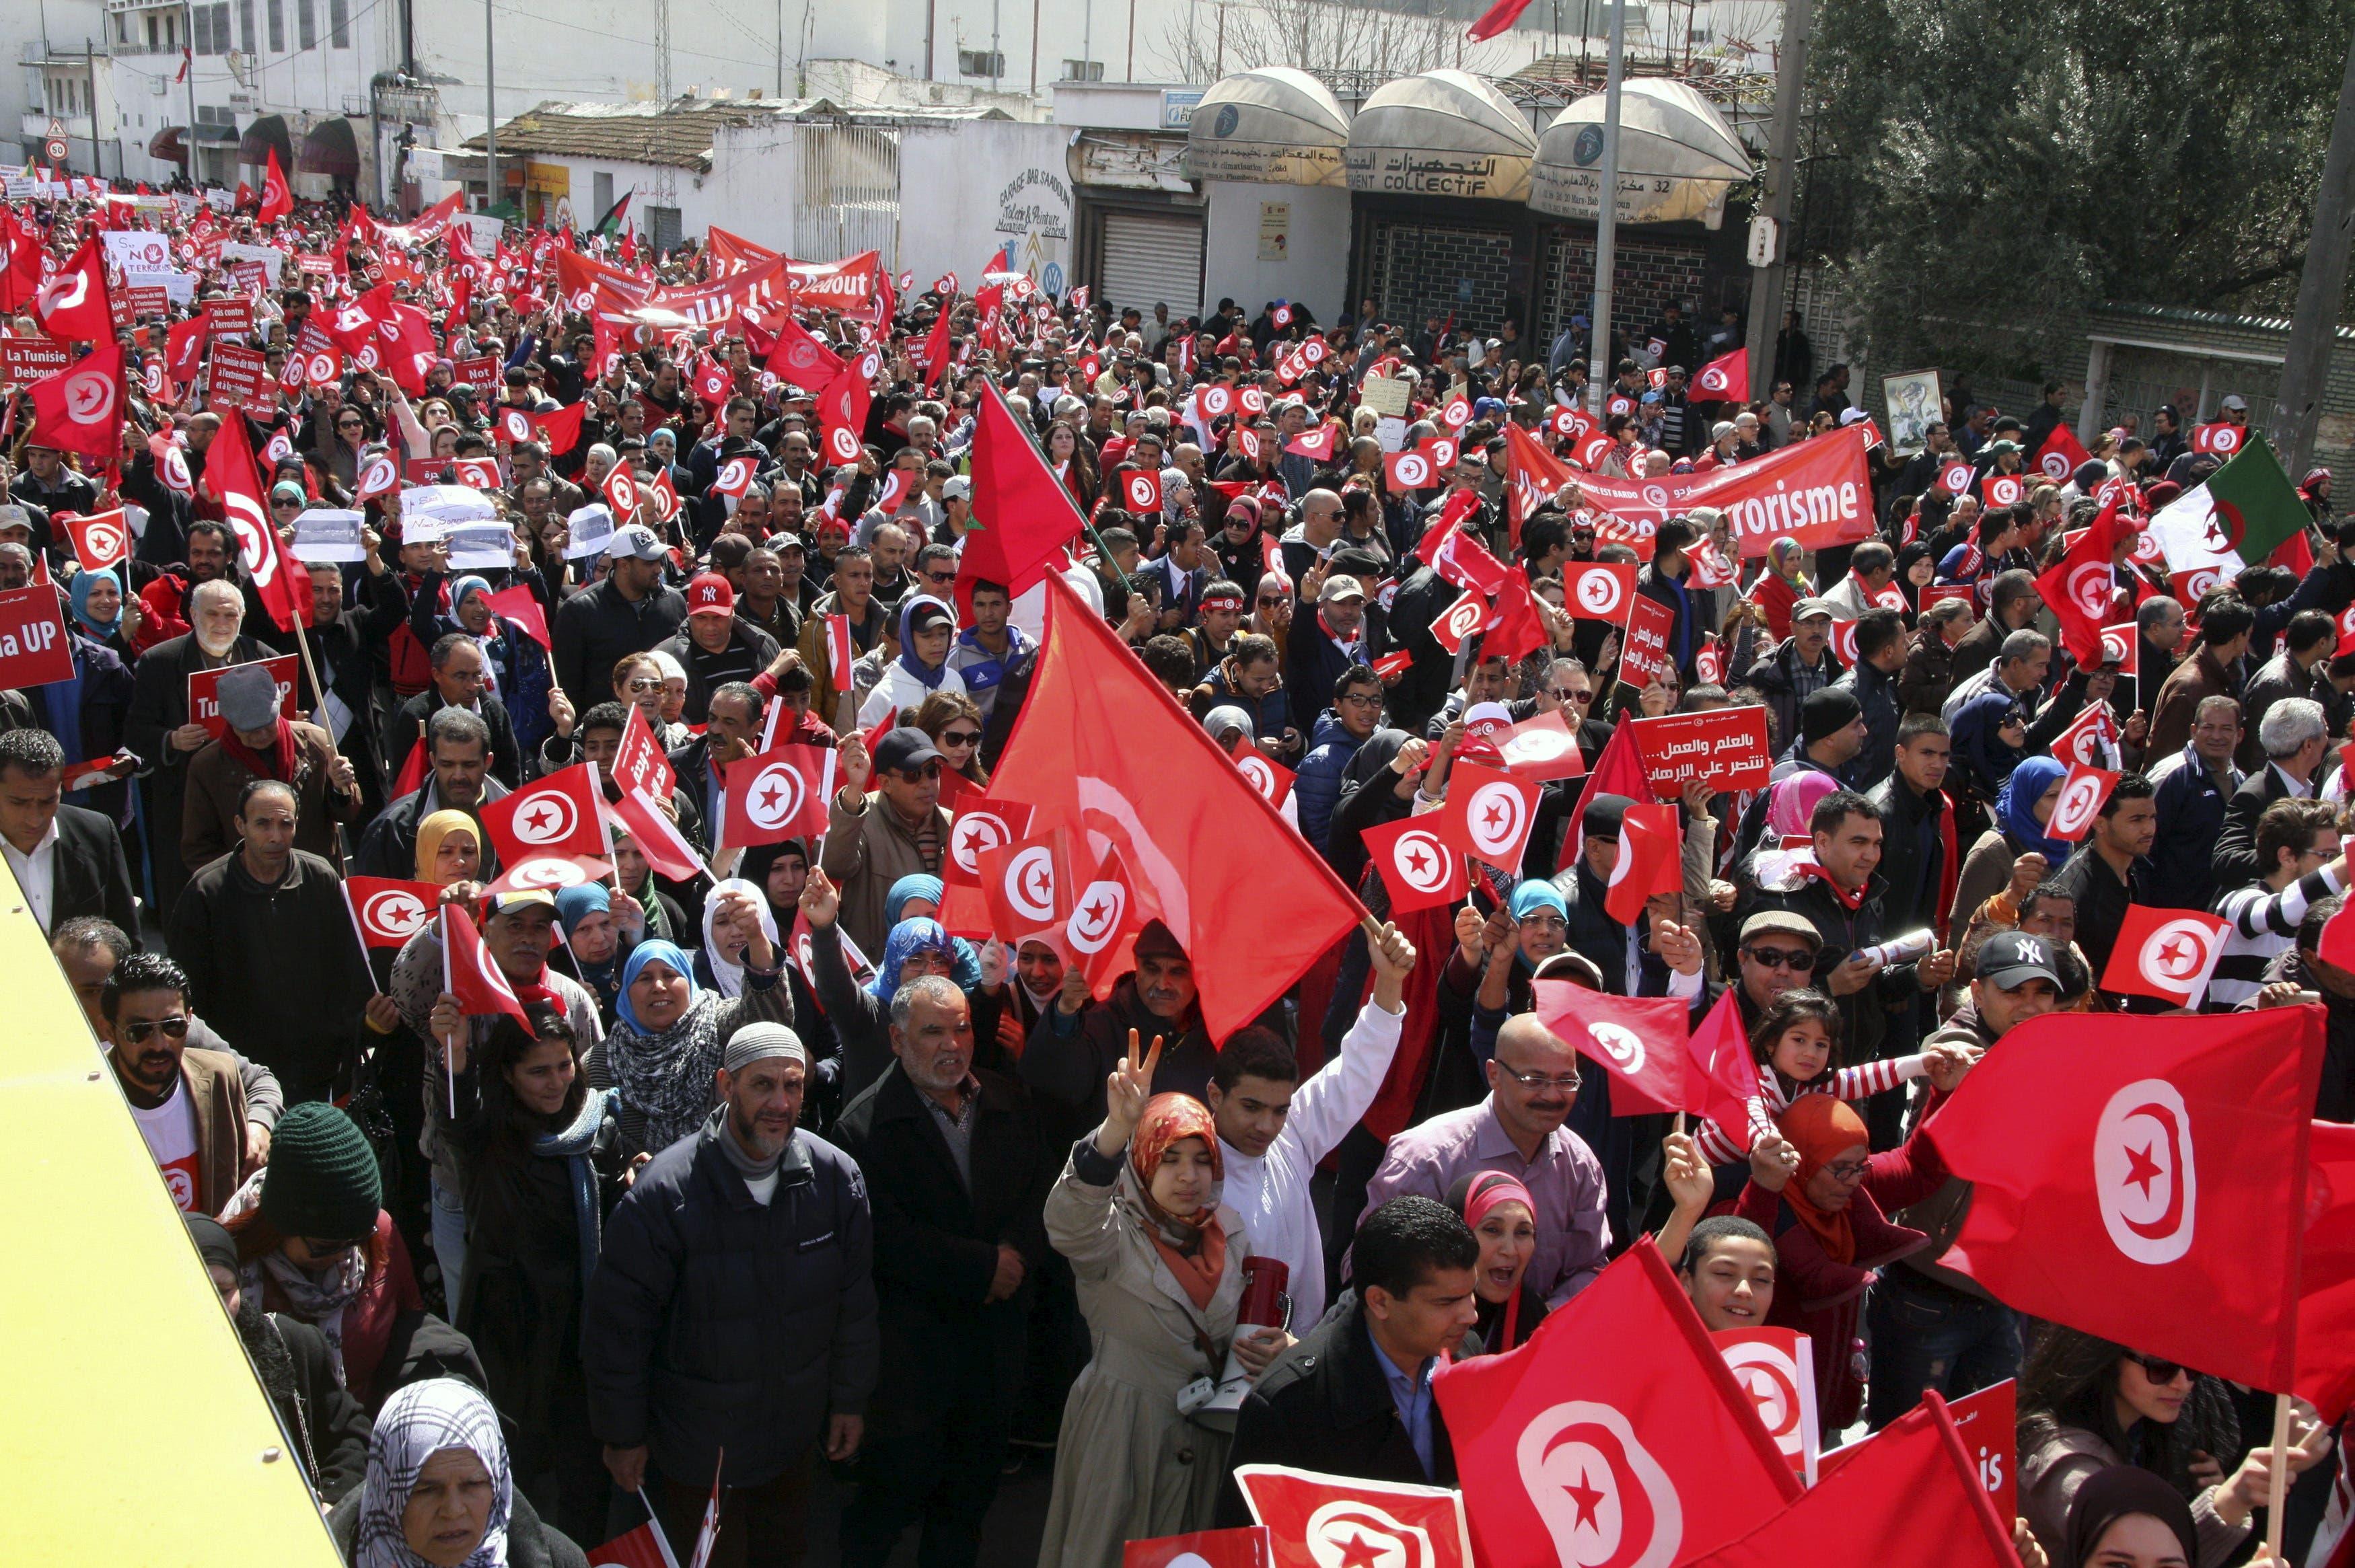 Tunisians march after Bardo Attack